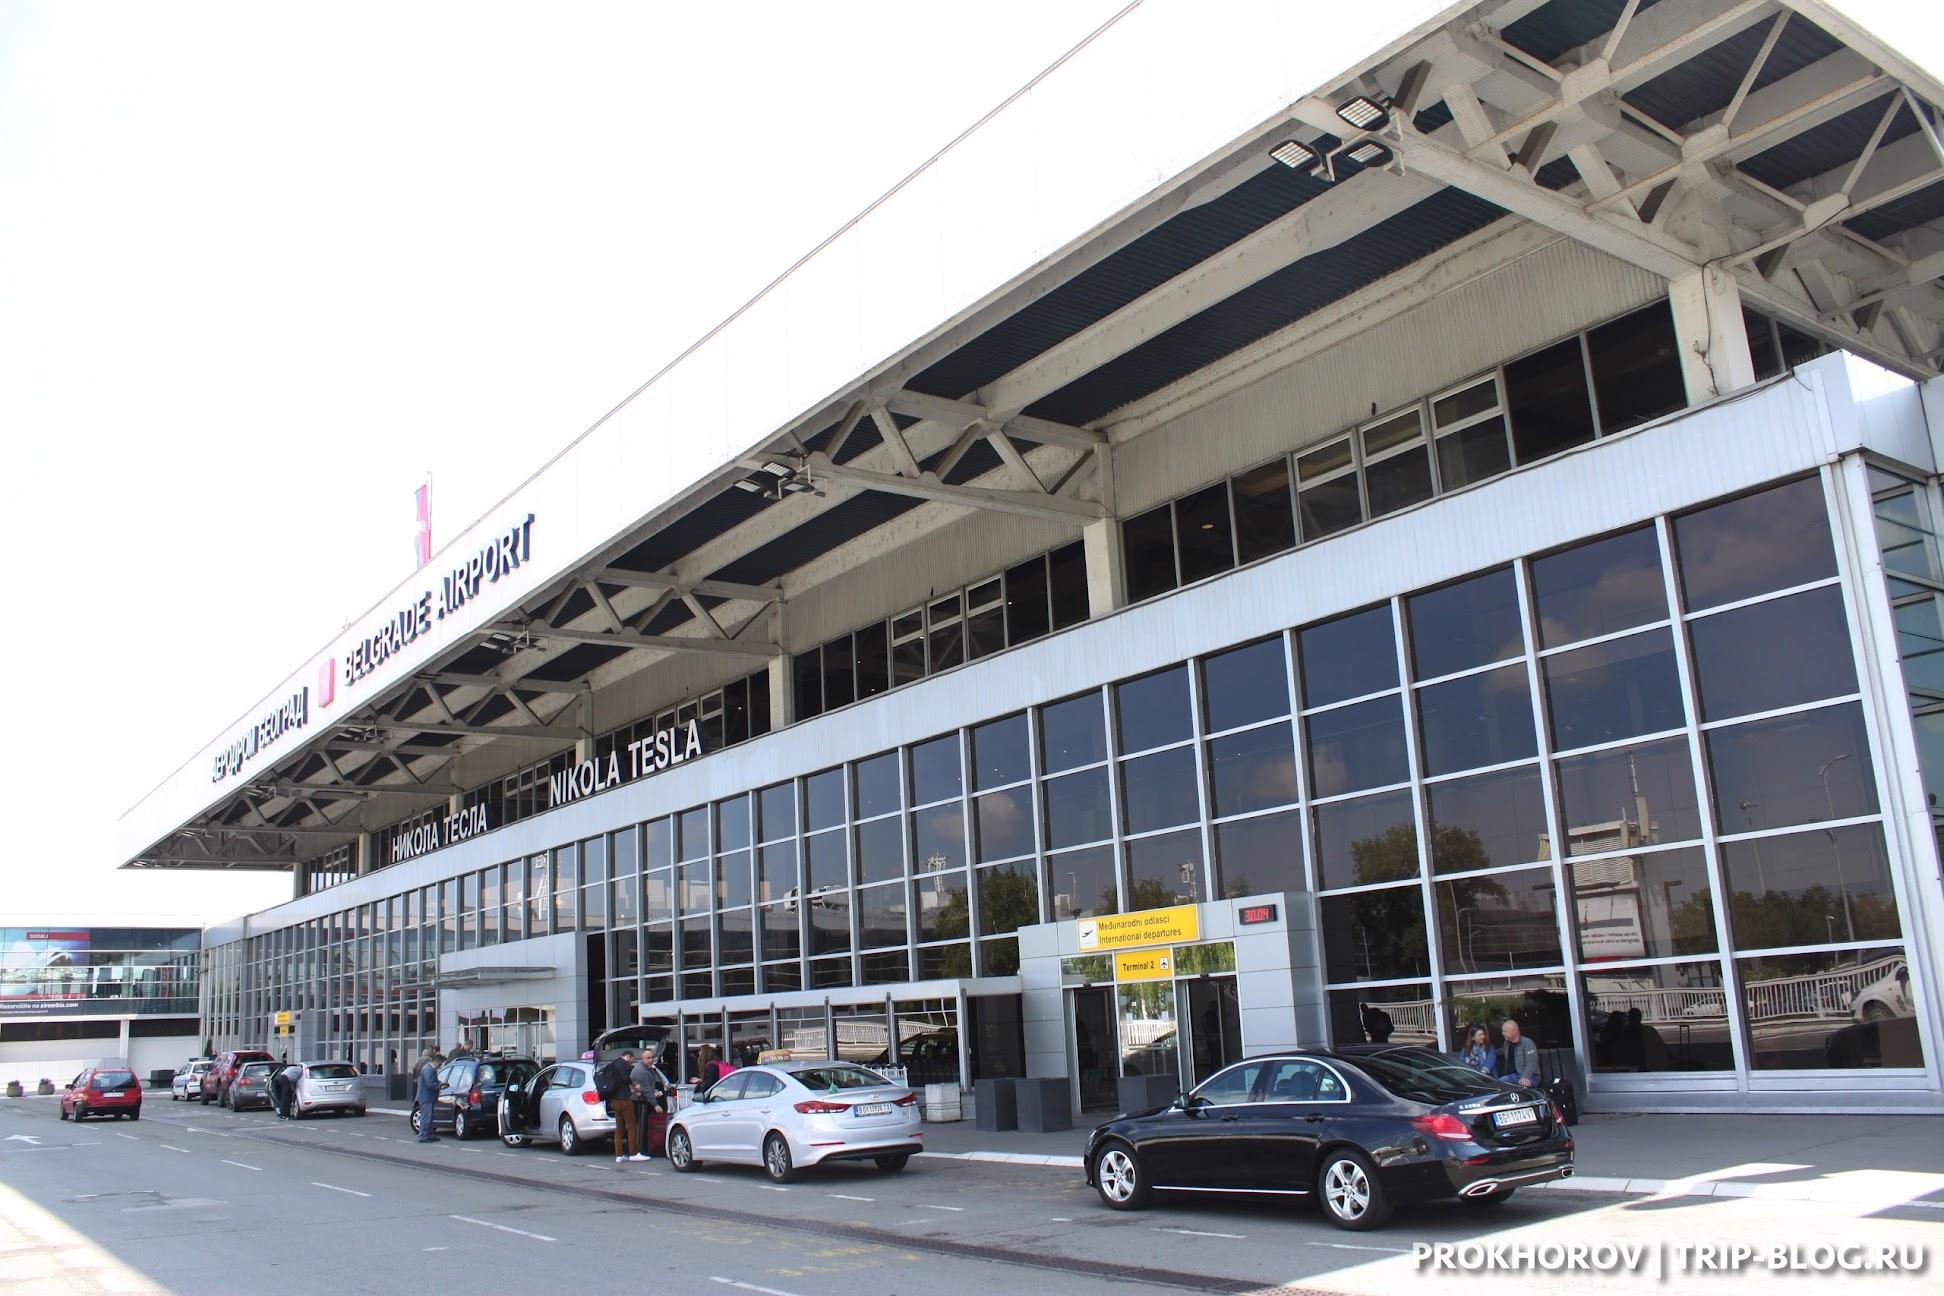 Аэропорт Никола Тесла в Белграде